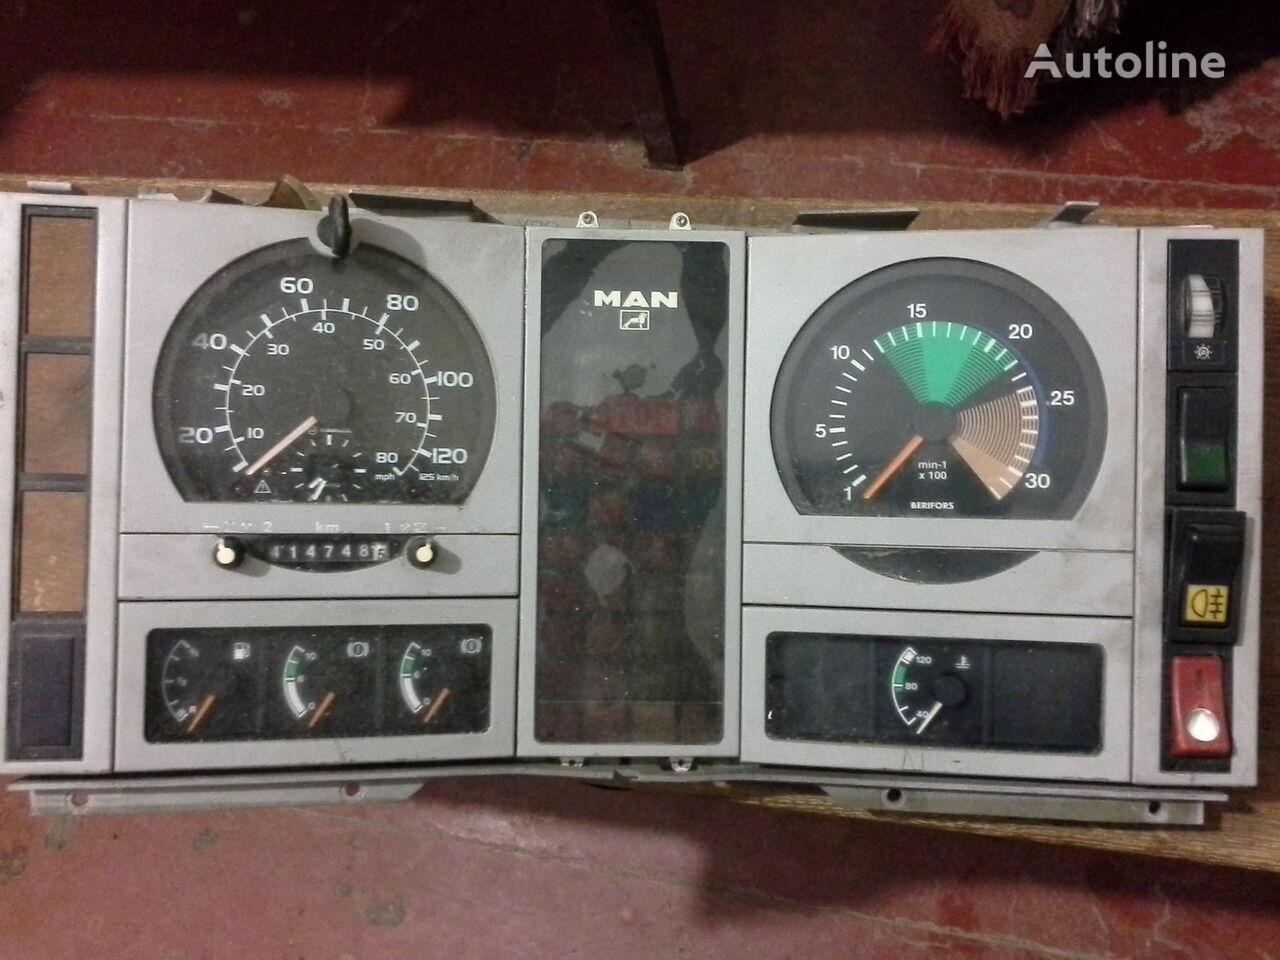 tachograf MAN Spidometr Tahometr originalni zapchasti kabini do ciężarówki MAN  L2000 Po zapchastyam